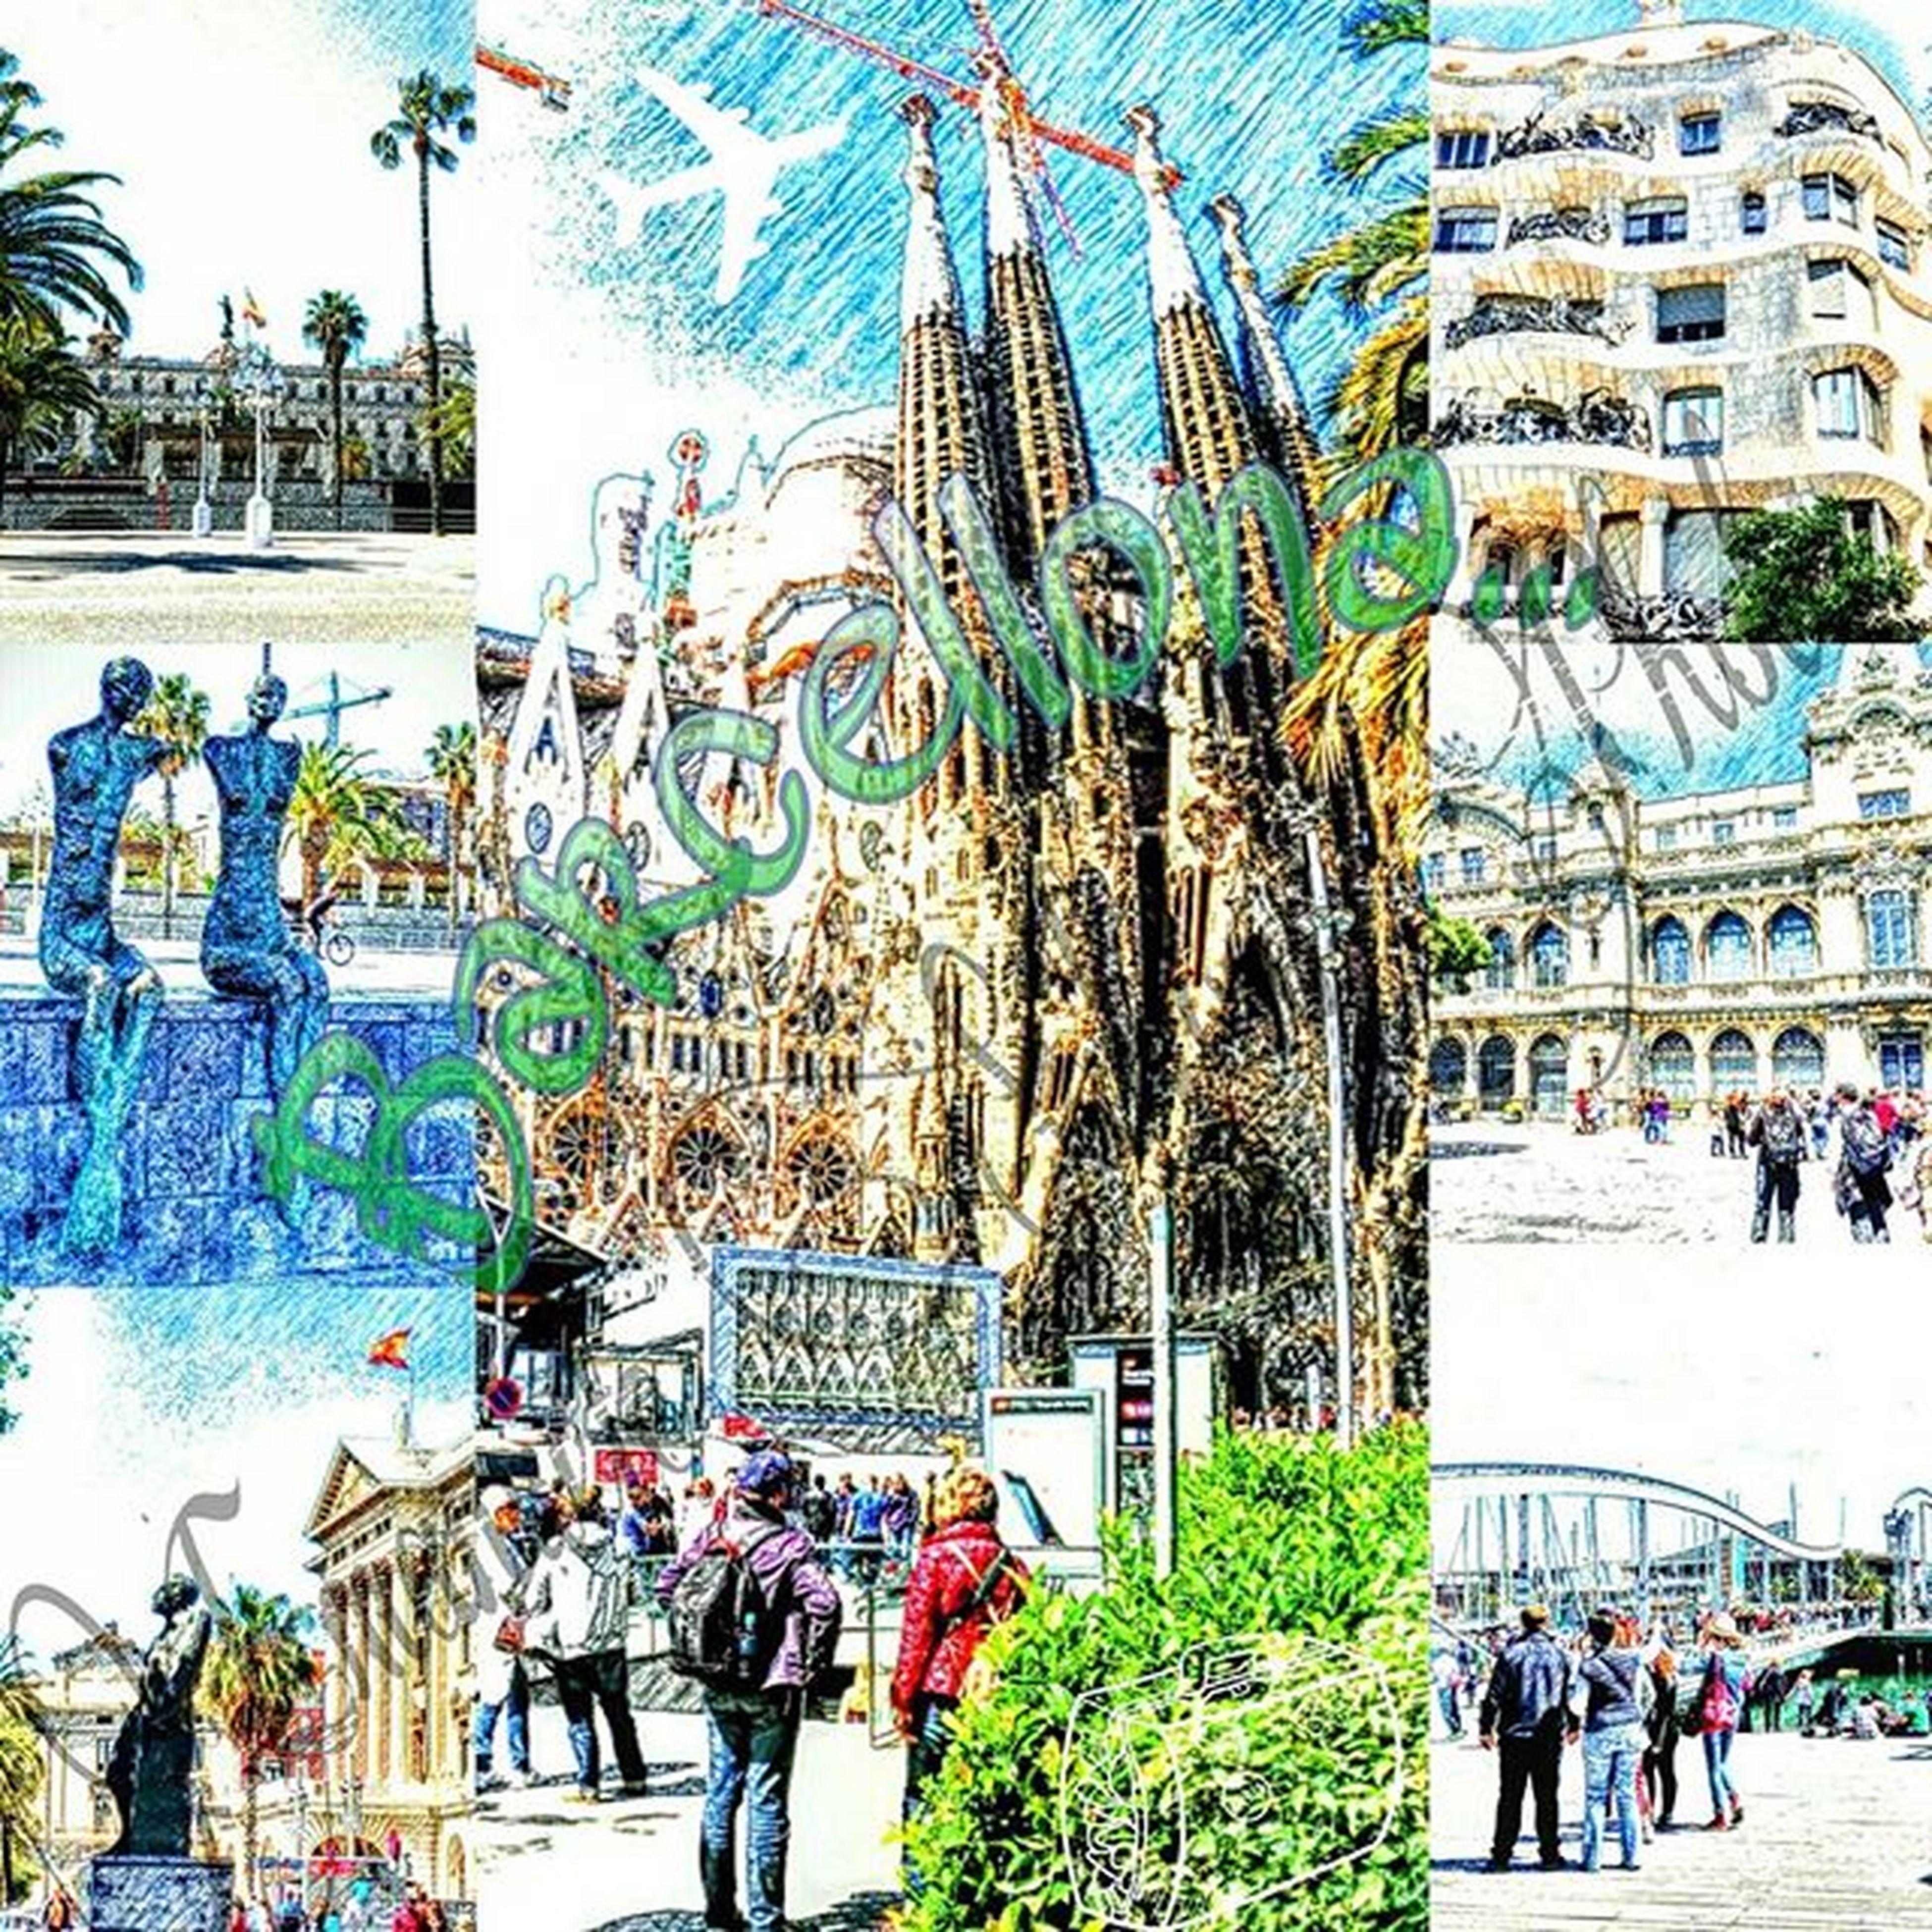 Effettomatita Barcellona Cartolinabarcellona Posterbarcellona Neweffect  Igersbarcelona Igerspagna Emanuelesalvoniphoto